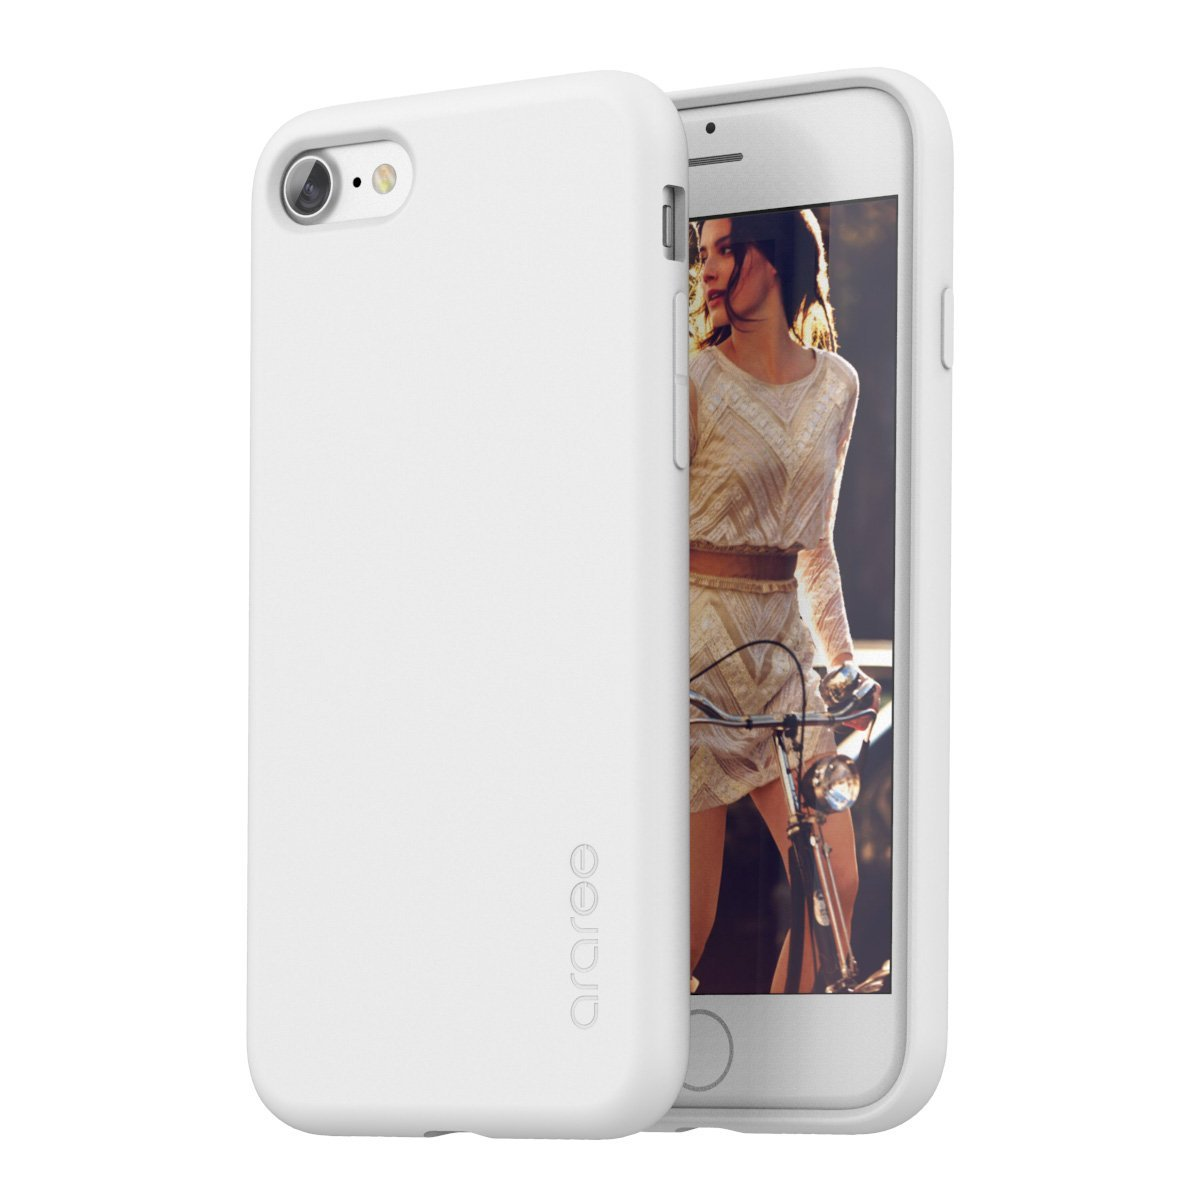 Pouzdro / kryt pro Apple iPhone 7 - Araree, Airfit White